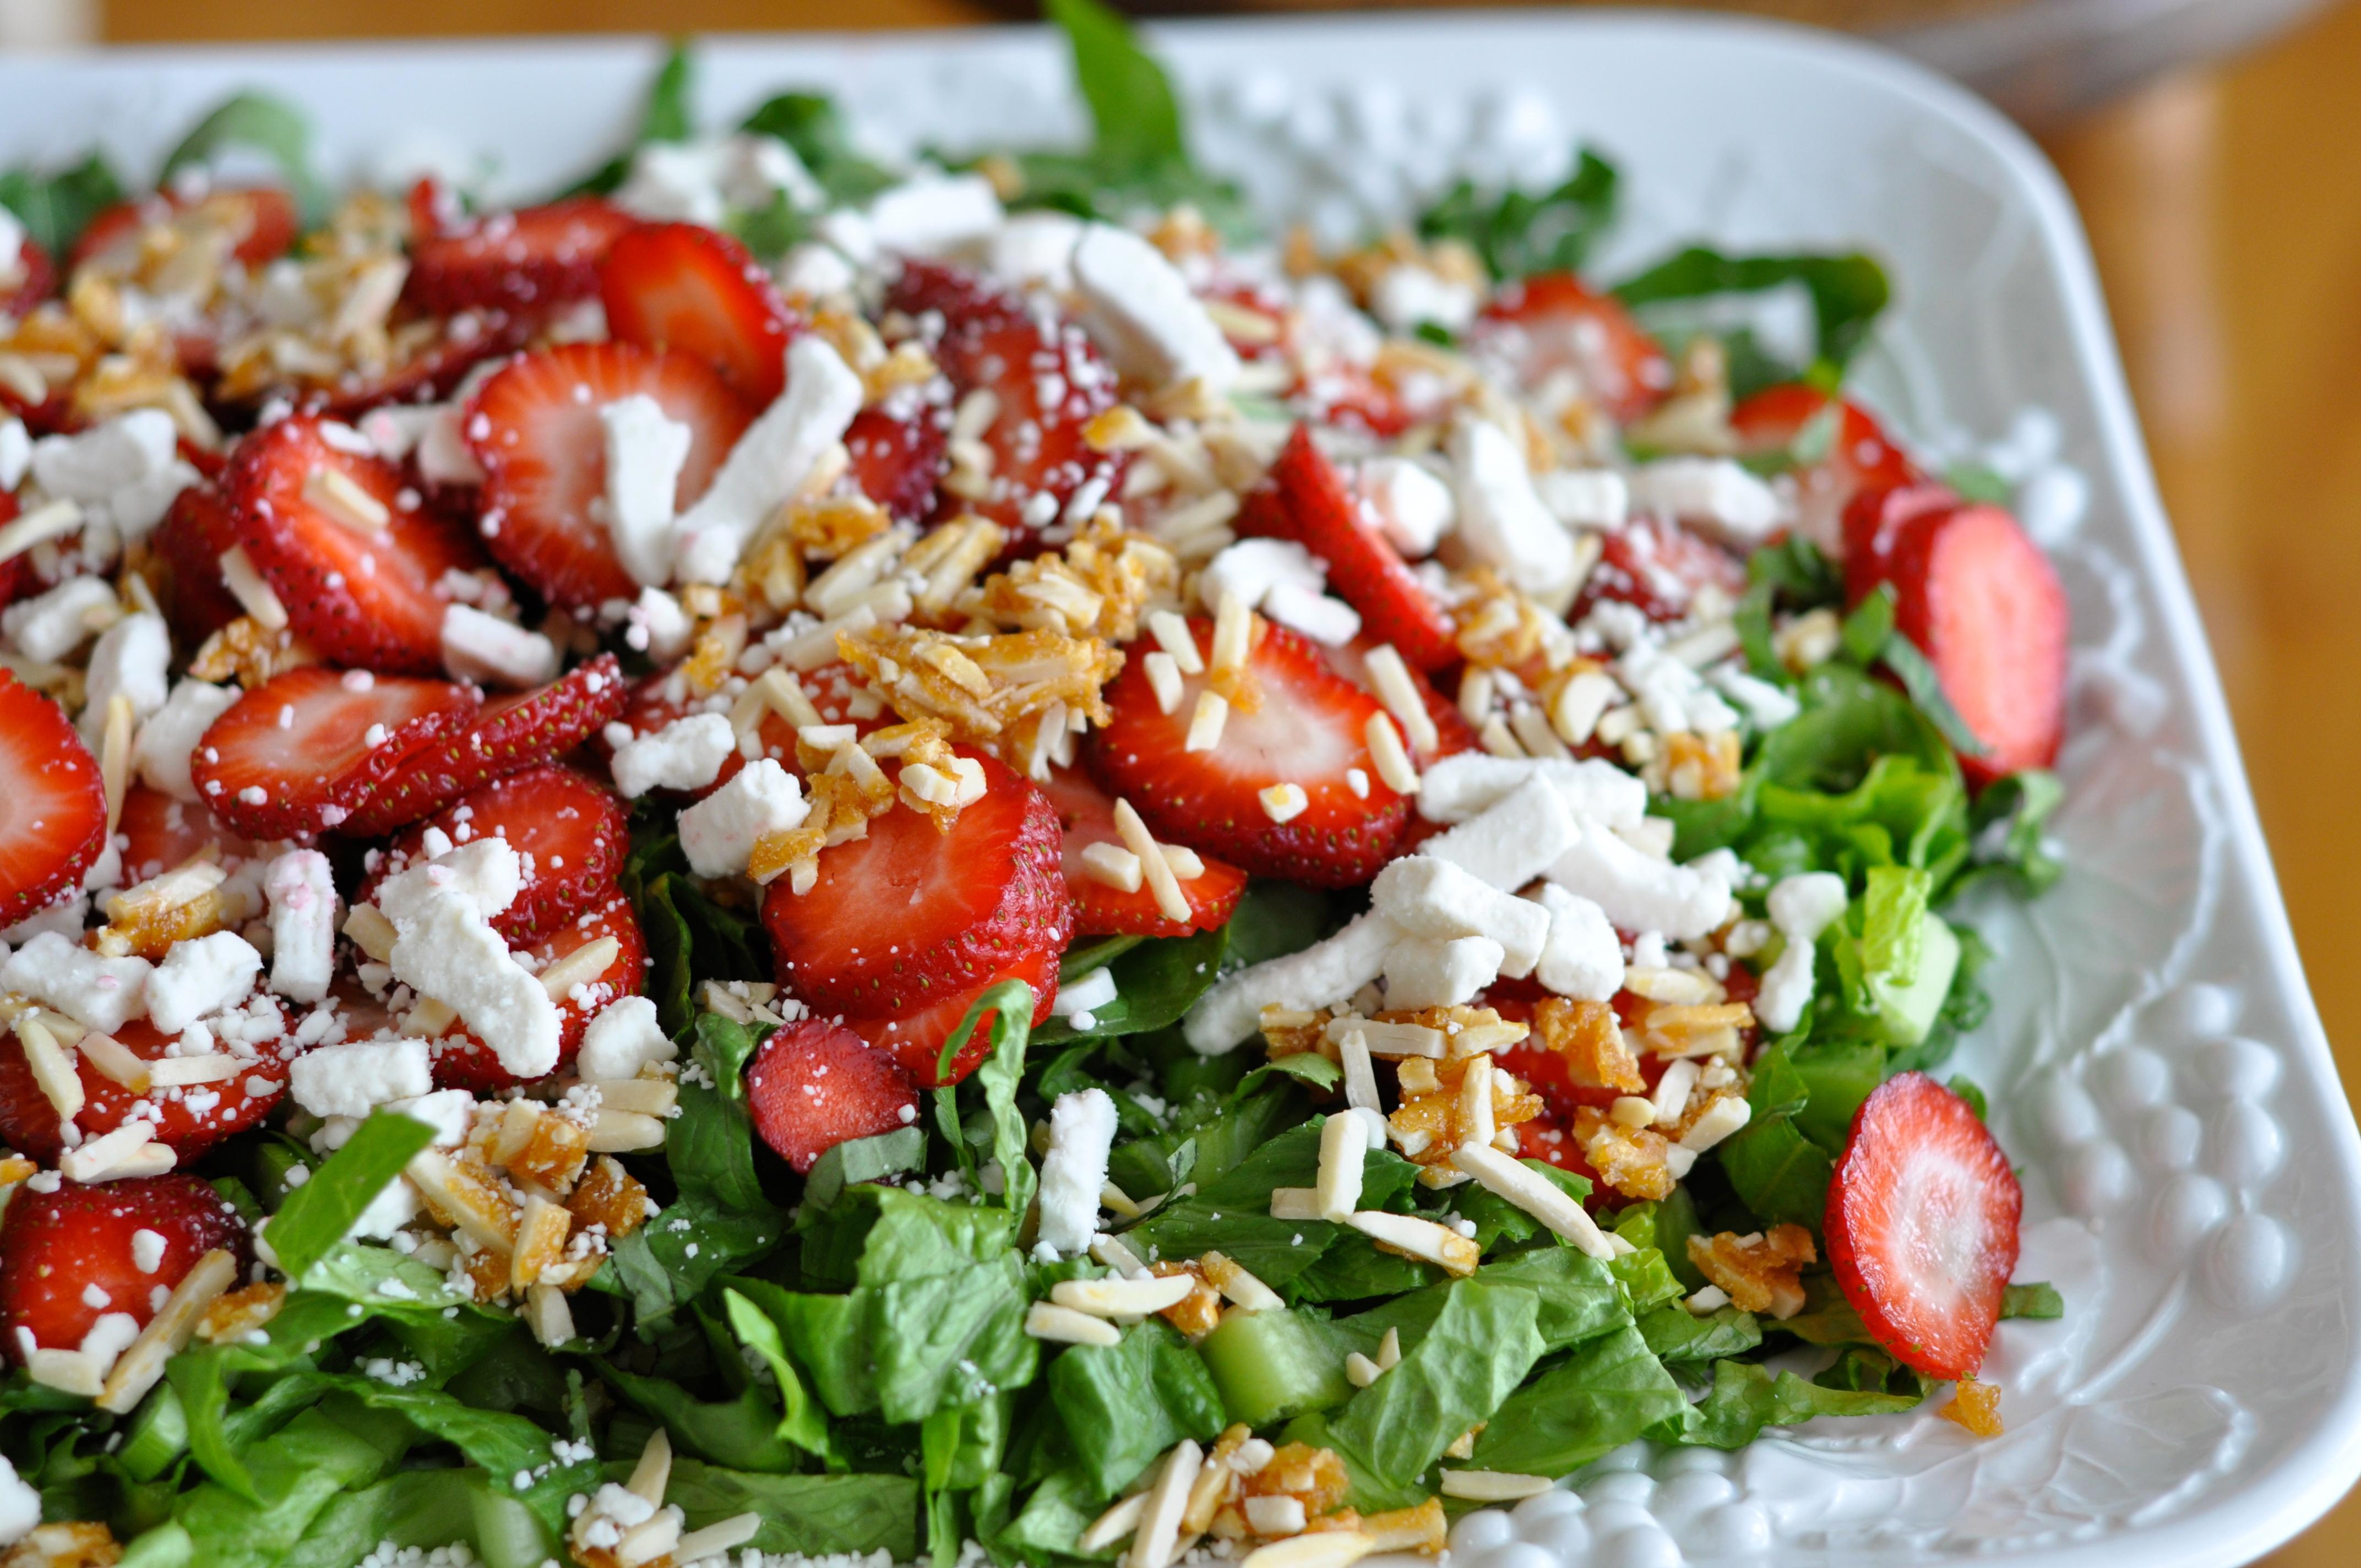 Strawberry Basil Salad with White Balsamic Vinaigrette ...